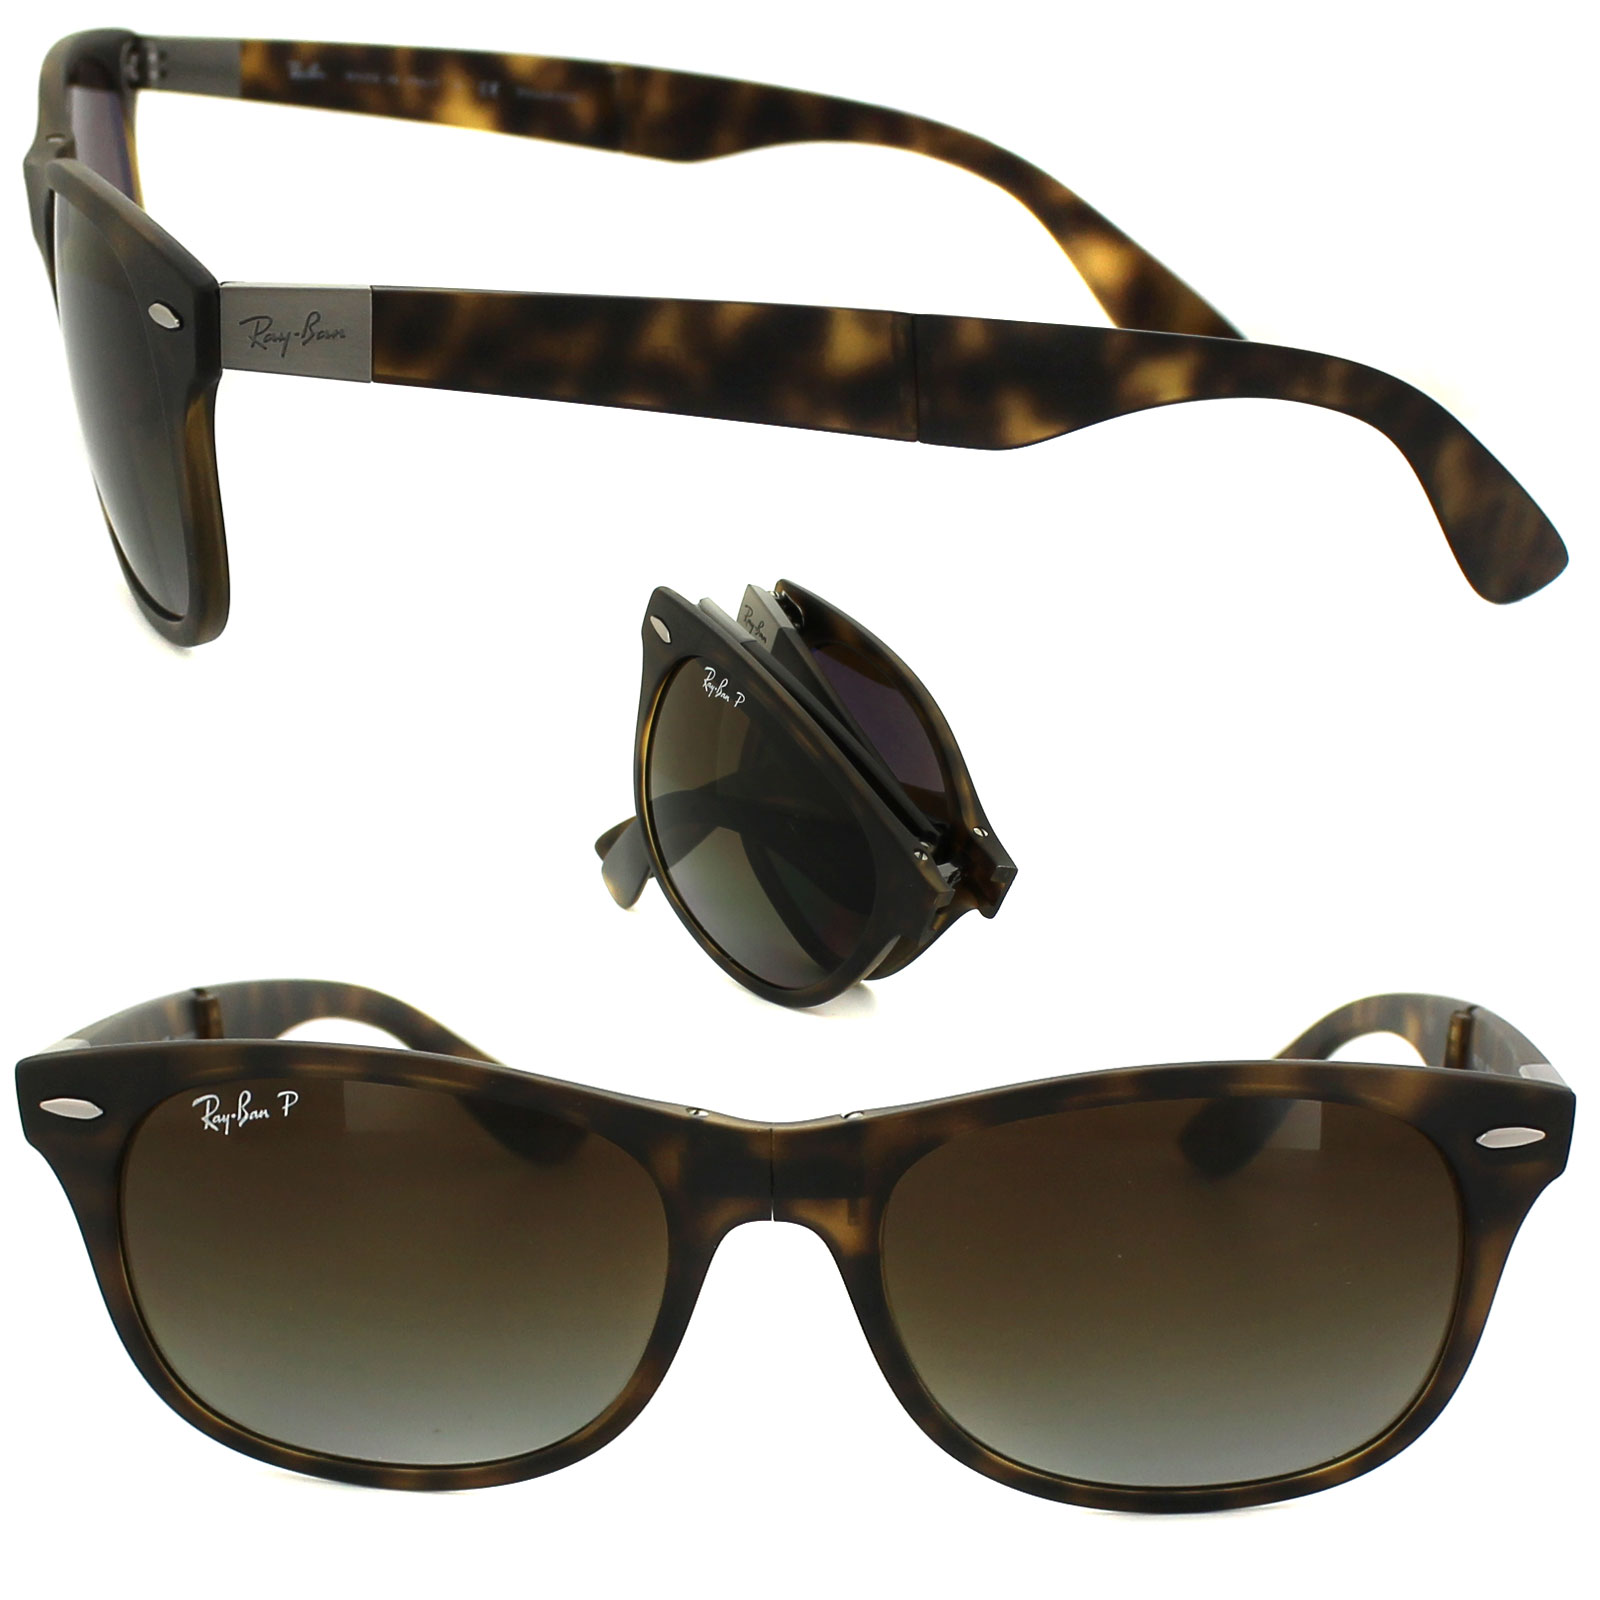 c1df99ae35 Cheap Ray-Ban 4223 Sunglasses - Discounted Sunglasses